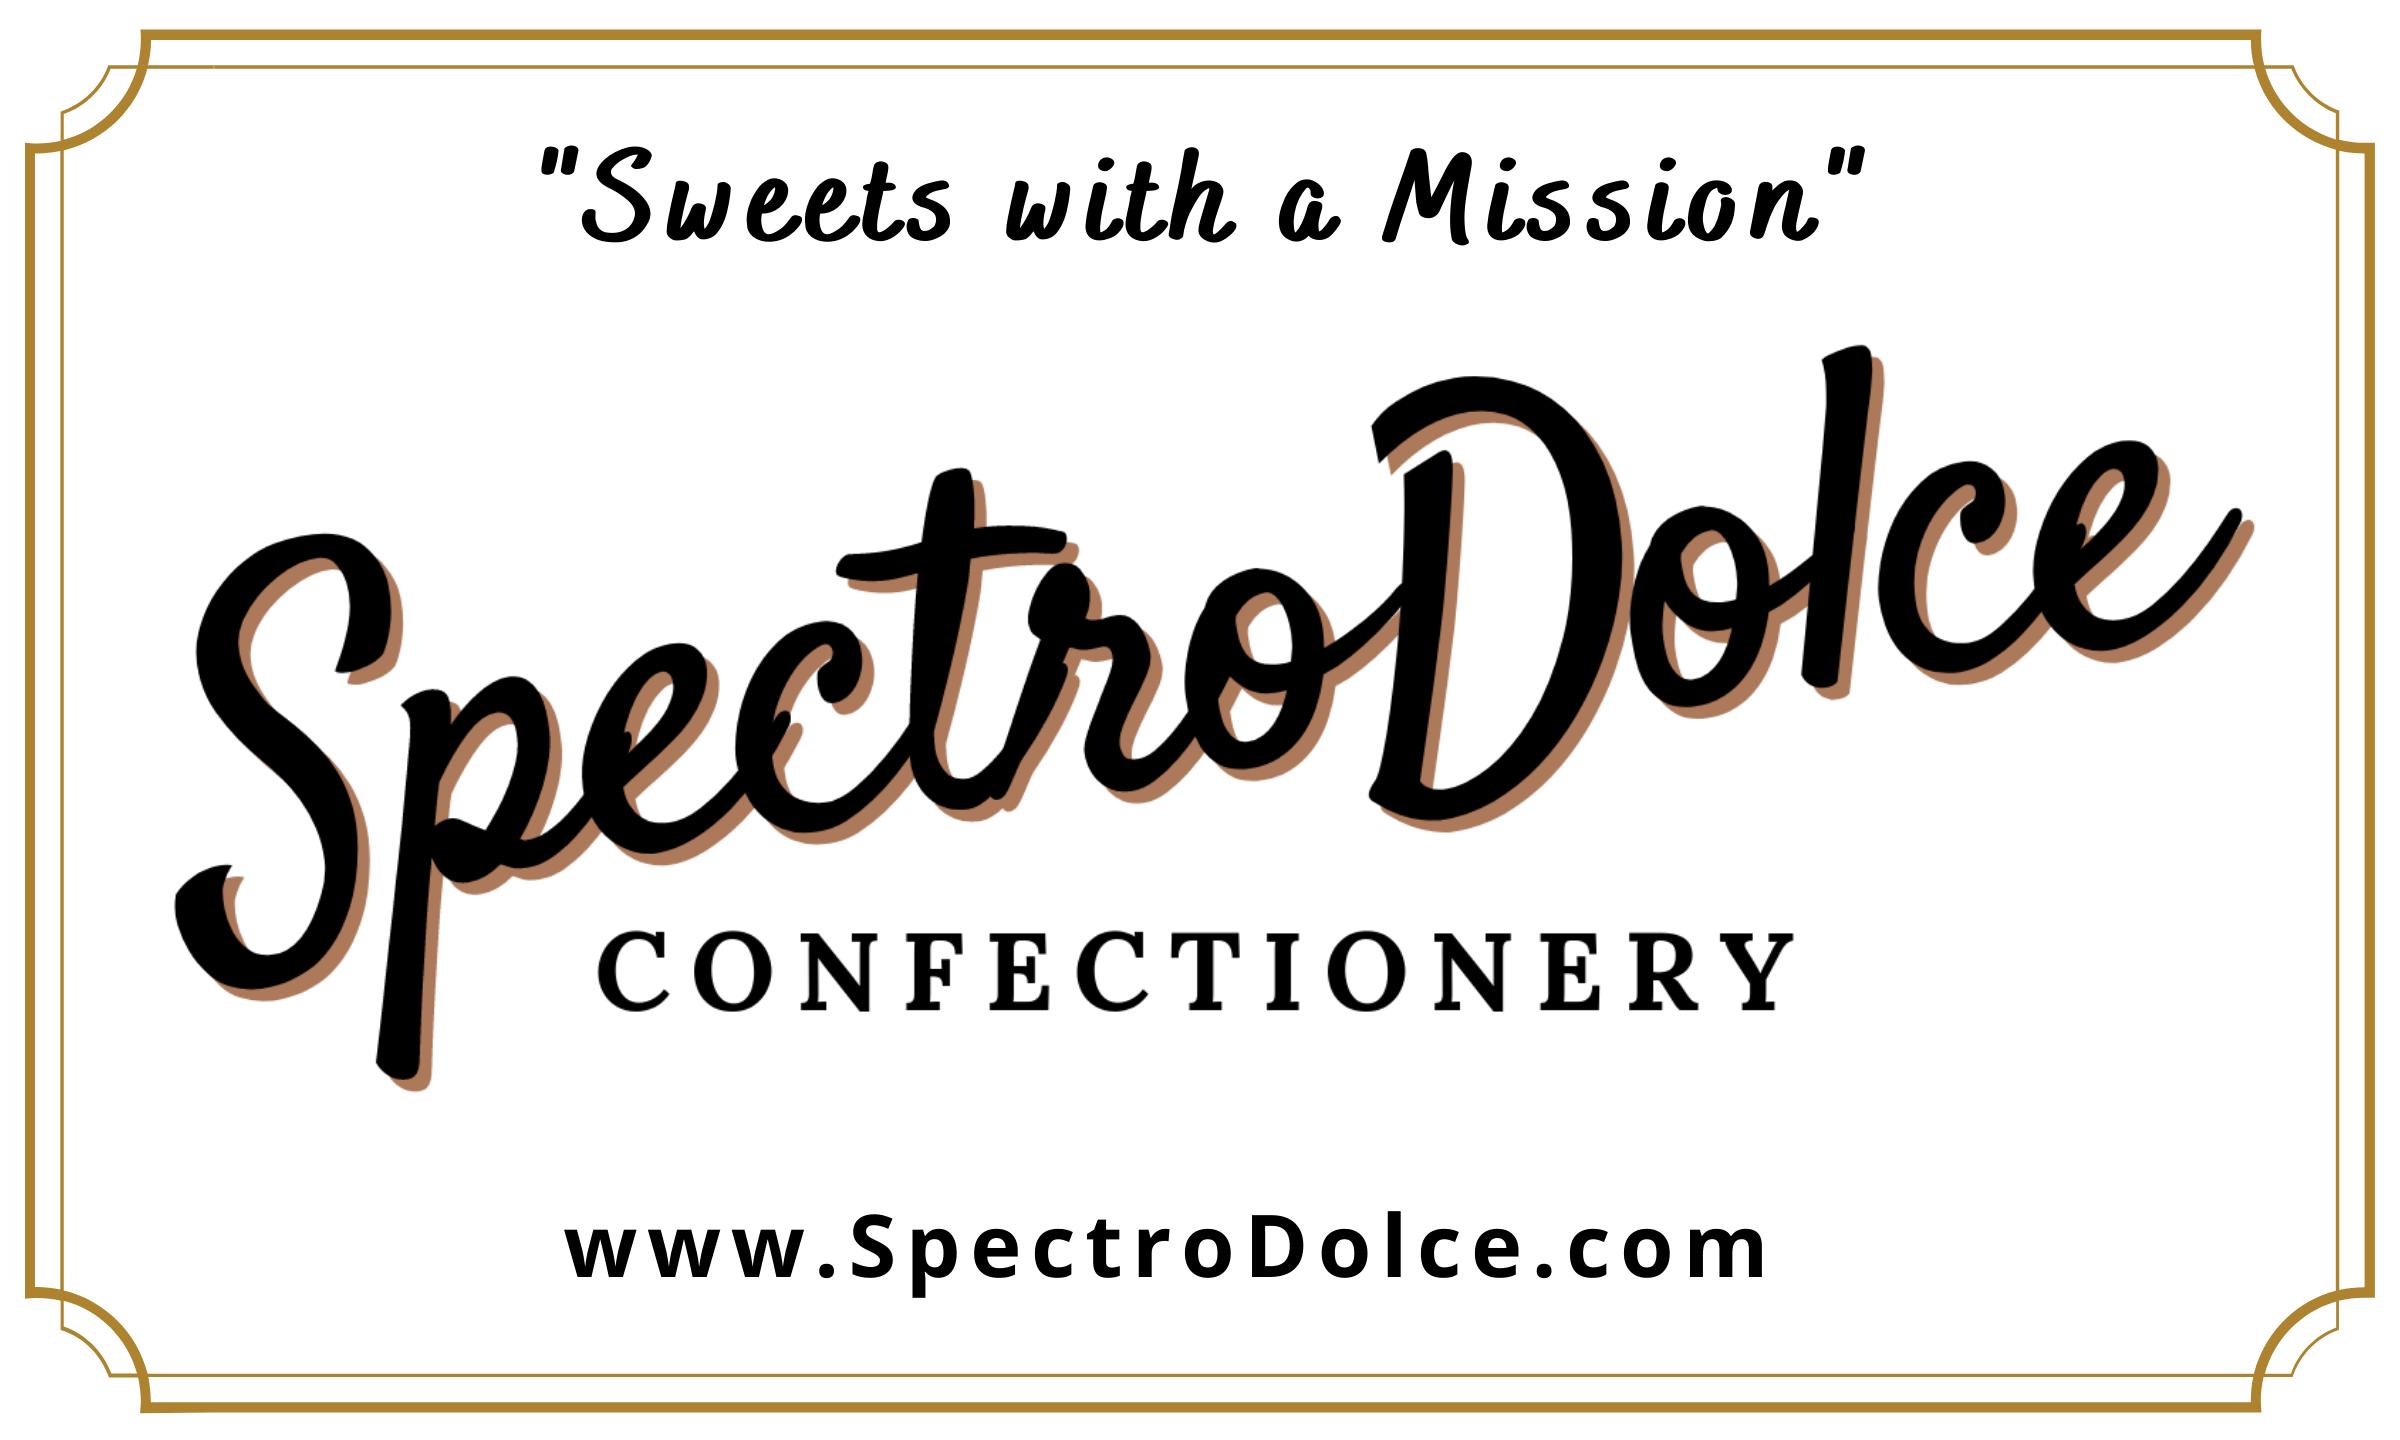 SpectroDolce Confectionery Logo